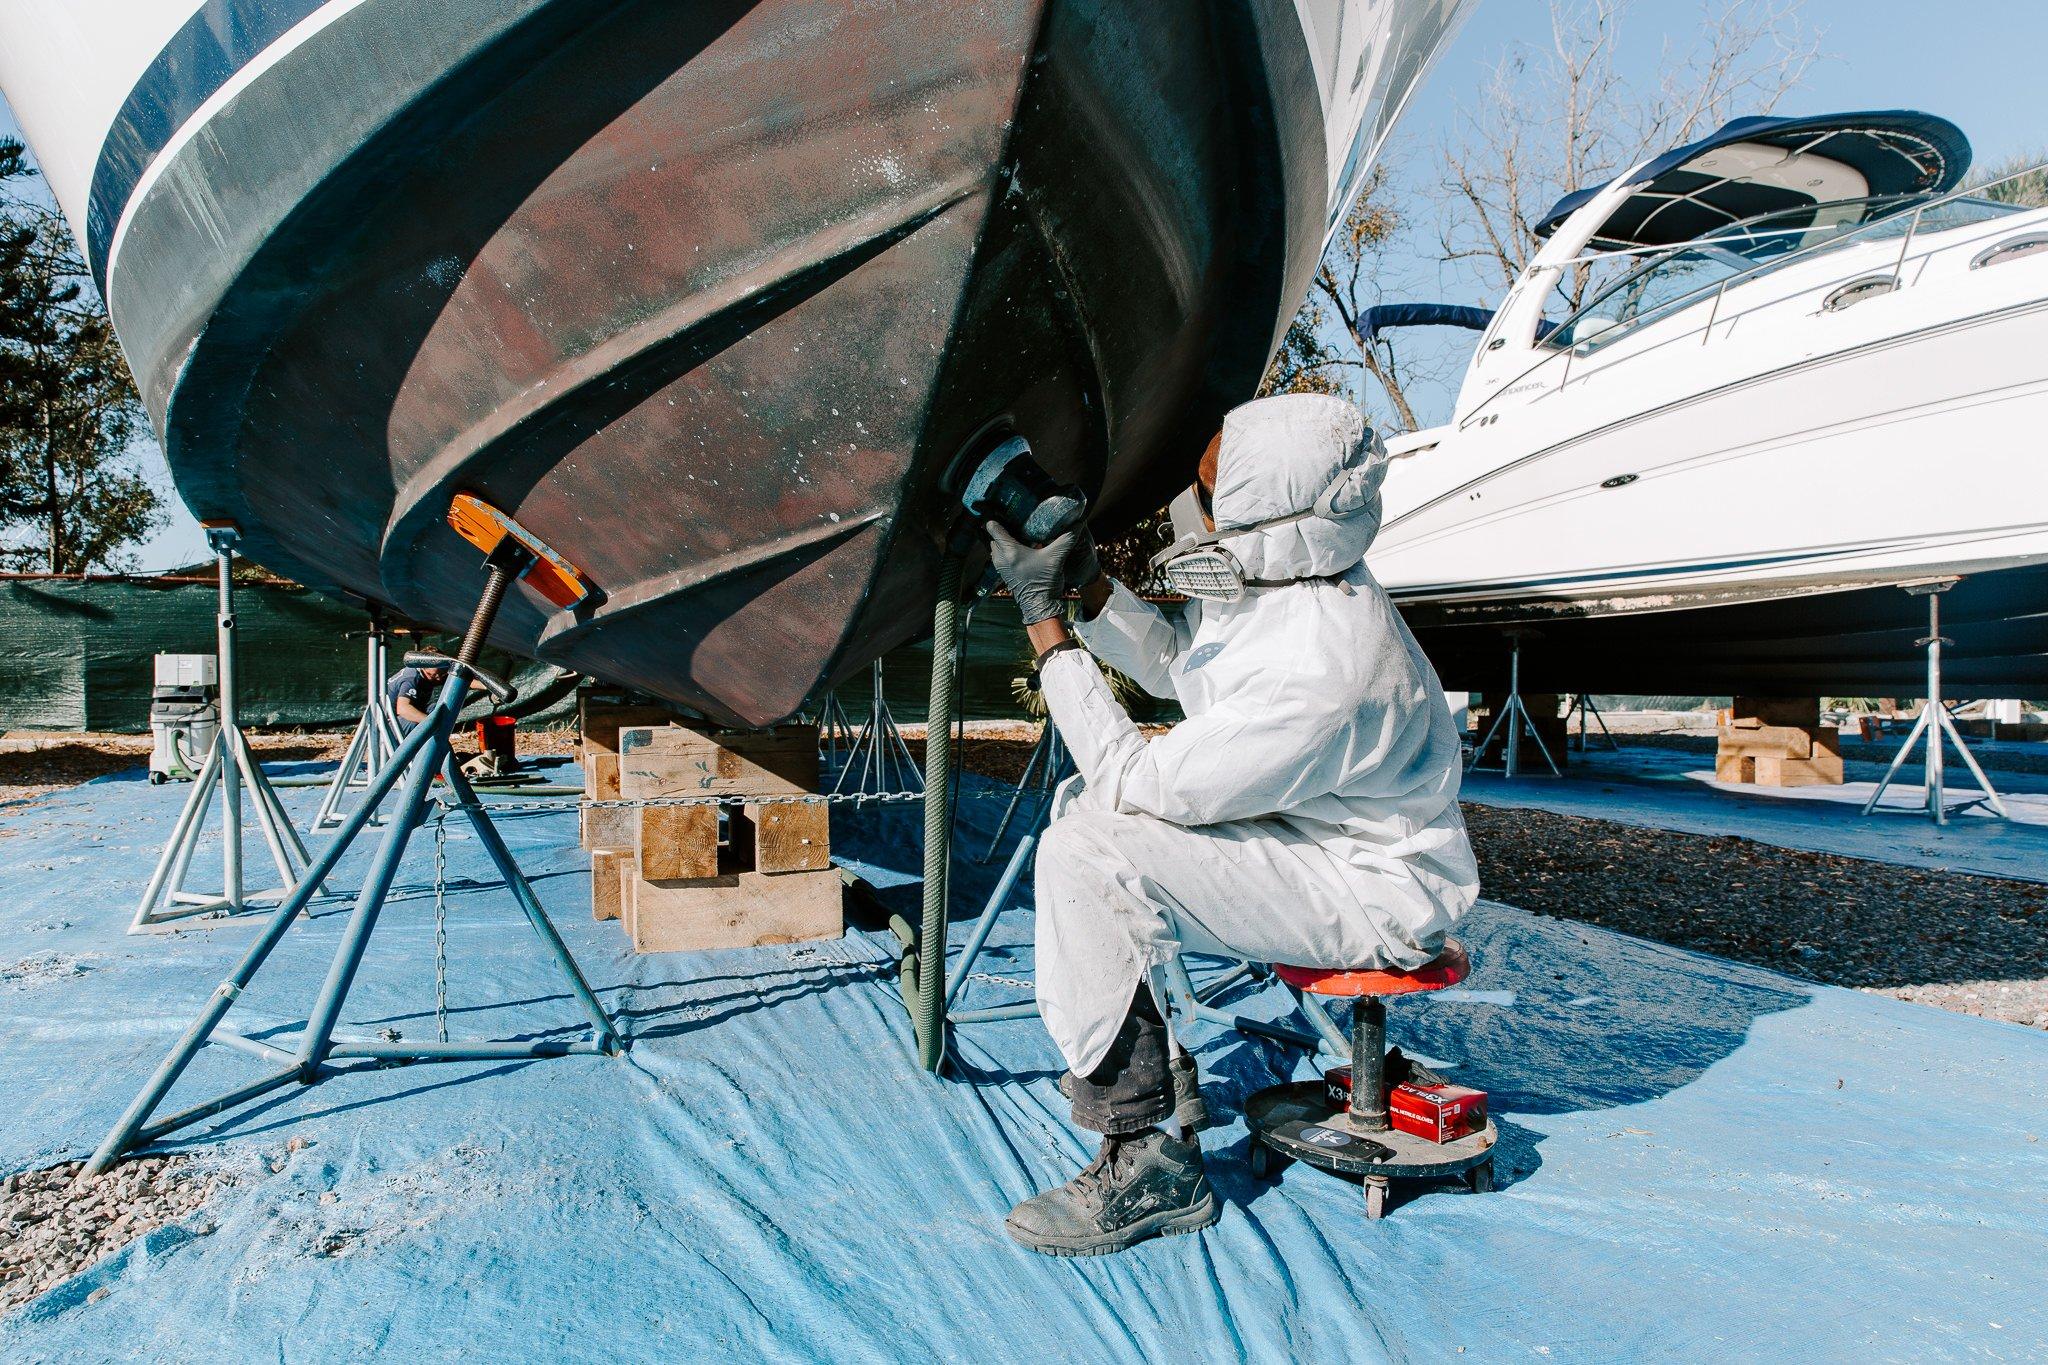 worker working on bottom boat job